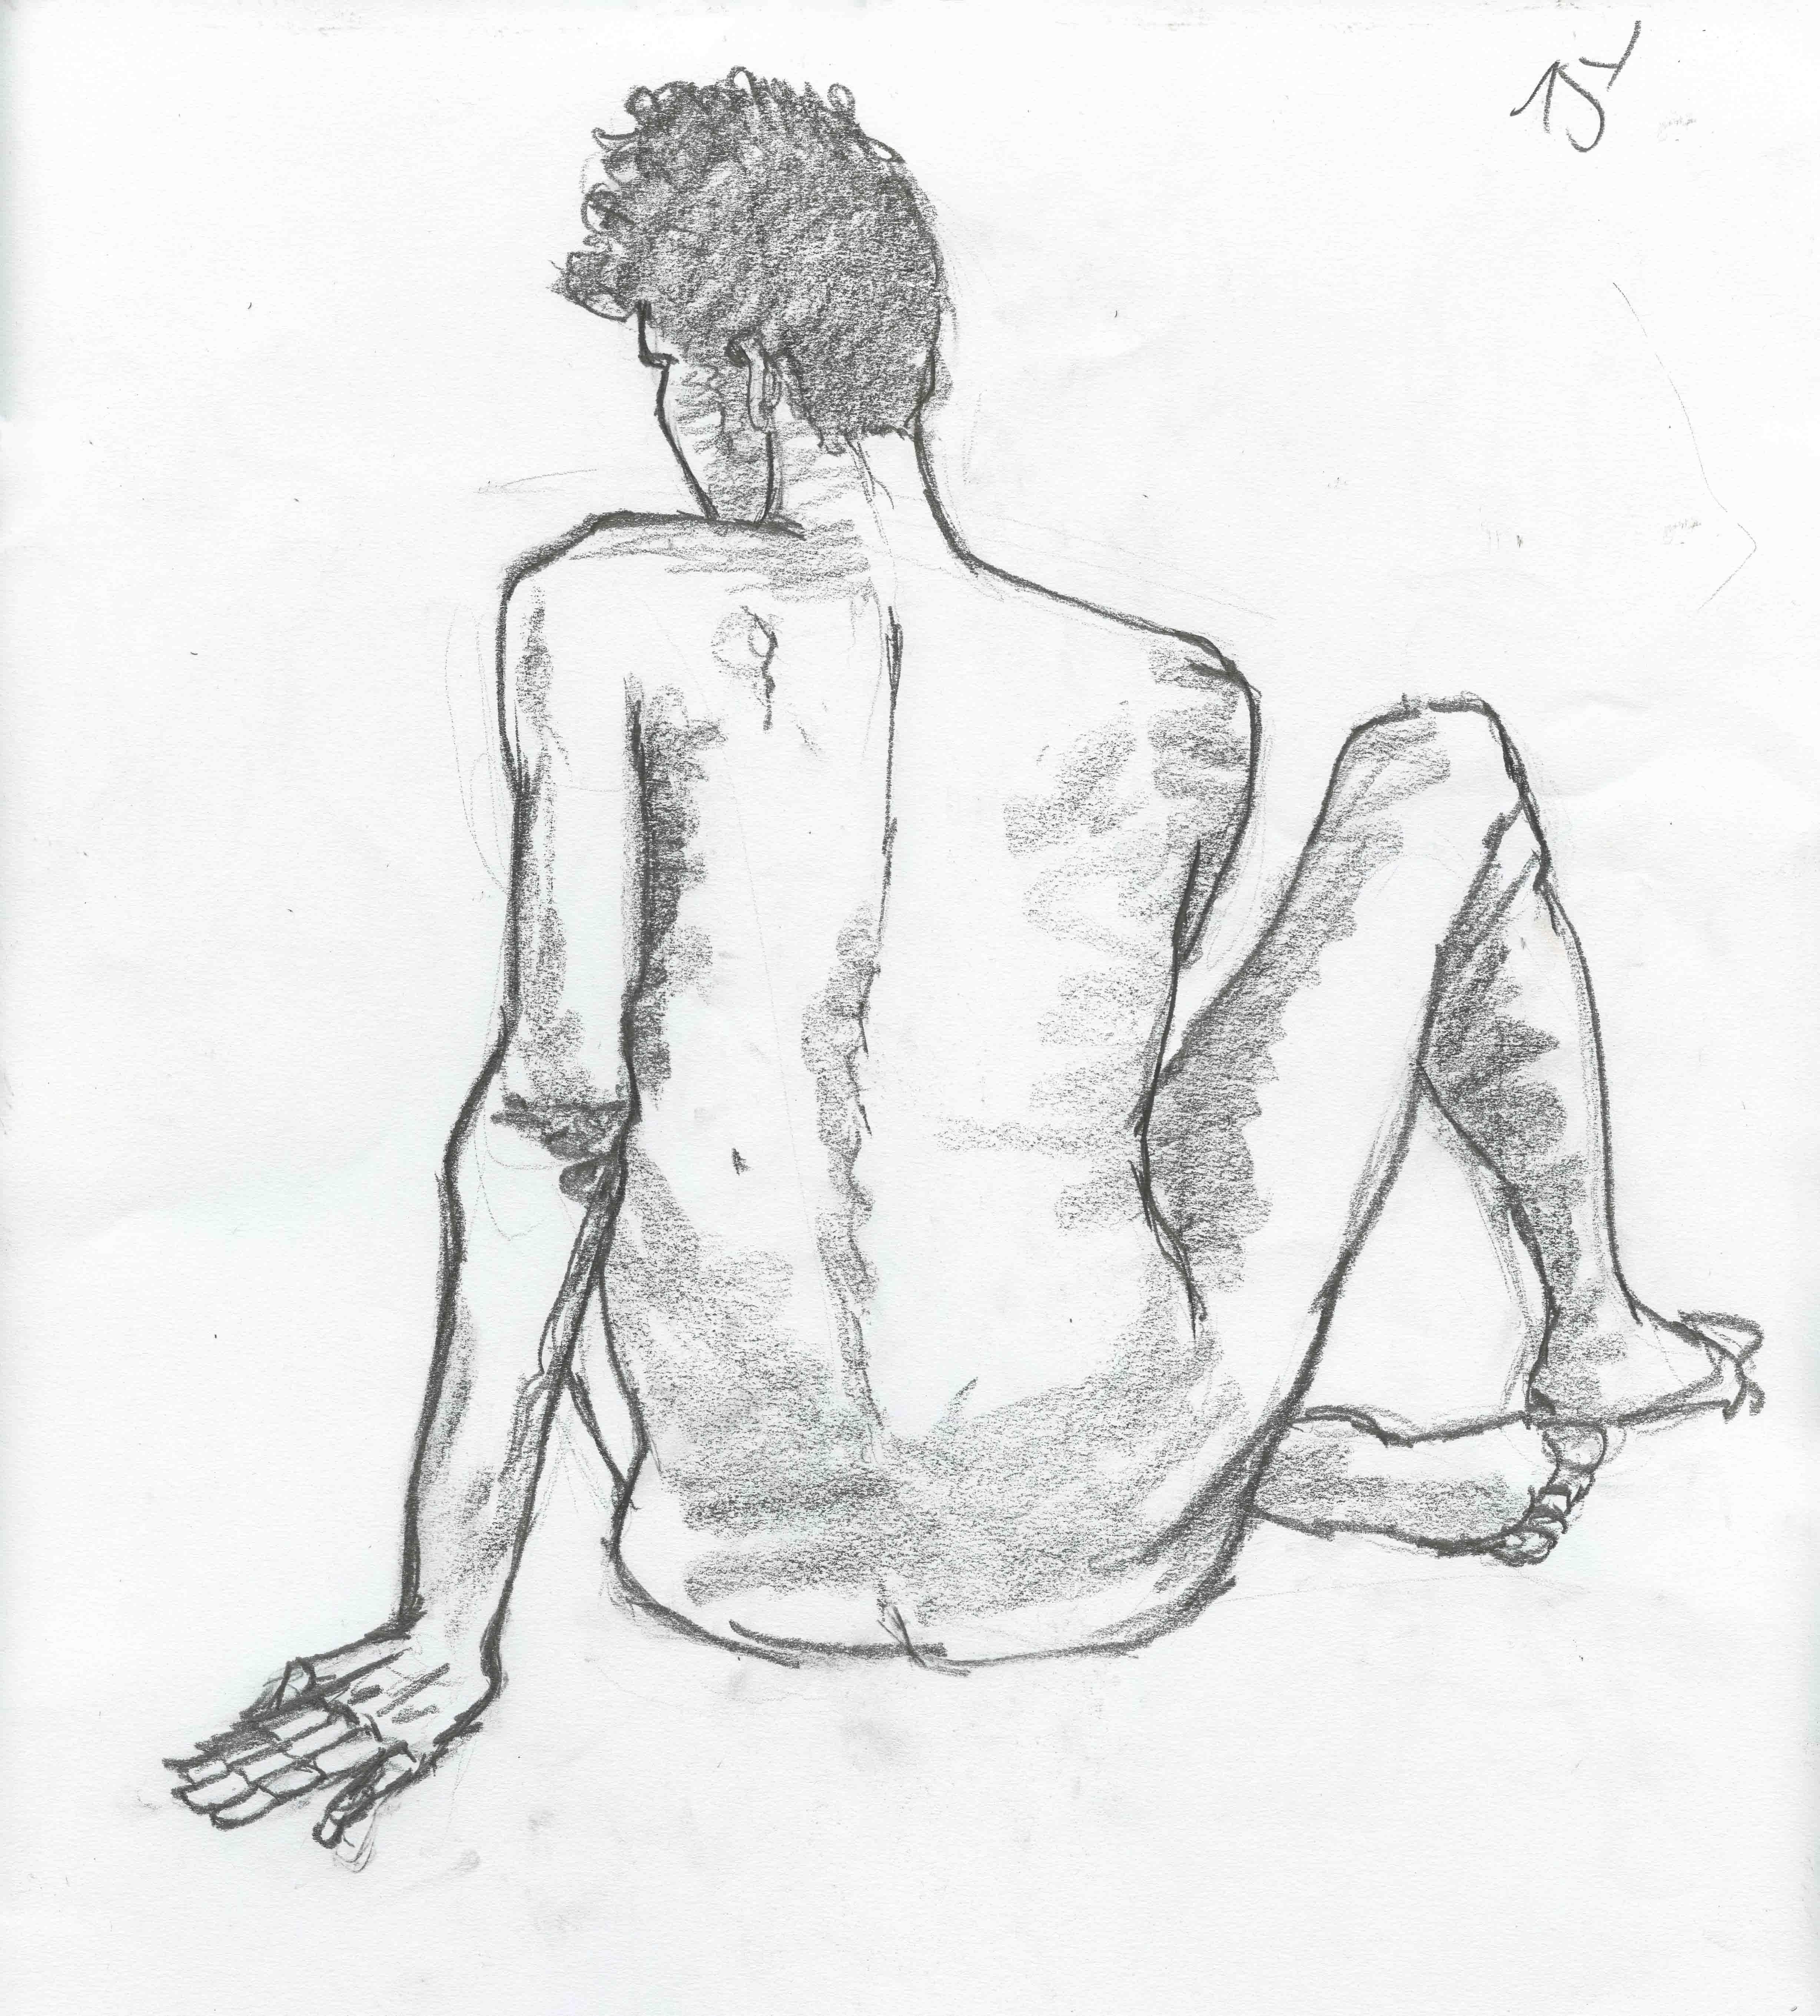 Noomis - Etudes, croquis & Wip [ Nudité ] - Page 6 160927110641808757